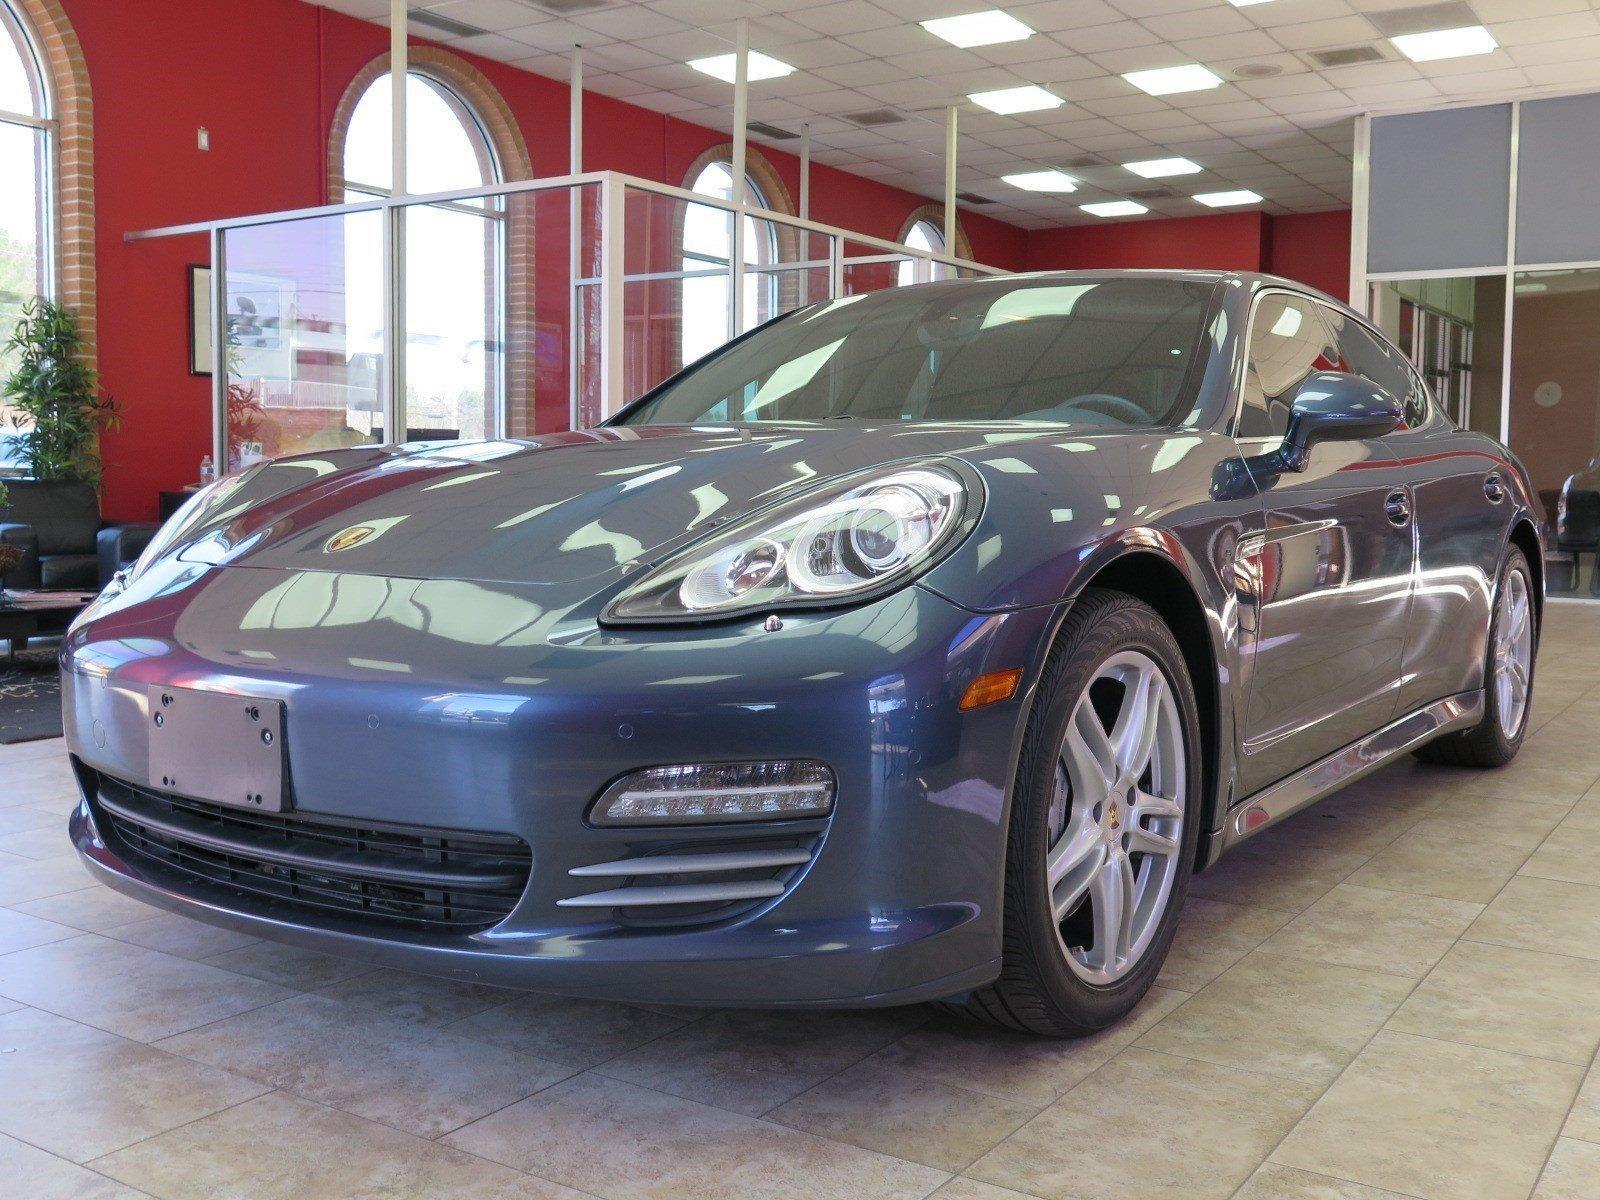 Used 2010 Porsche Panamera 4S for sale Sold at Gravity Autos Atlanta in Chamblee GA 30341 3